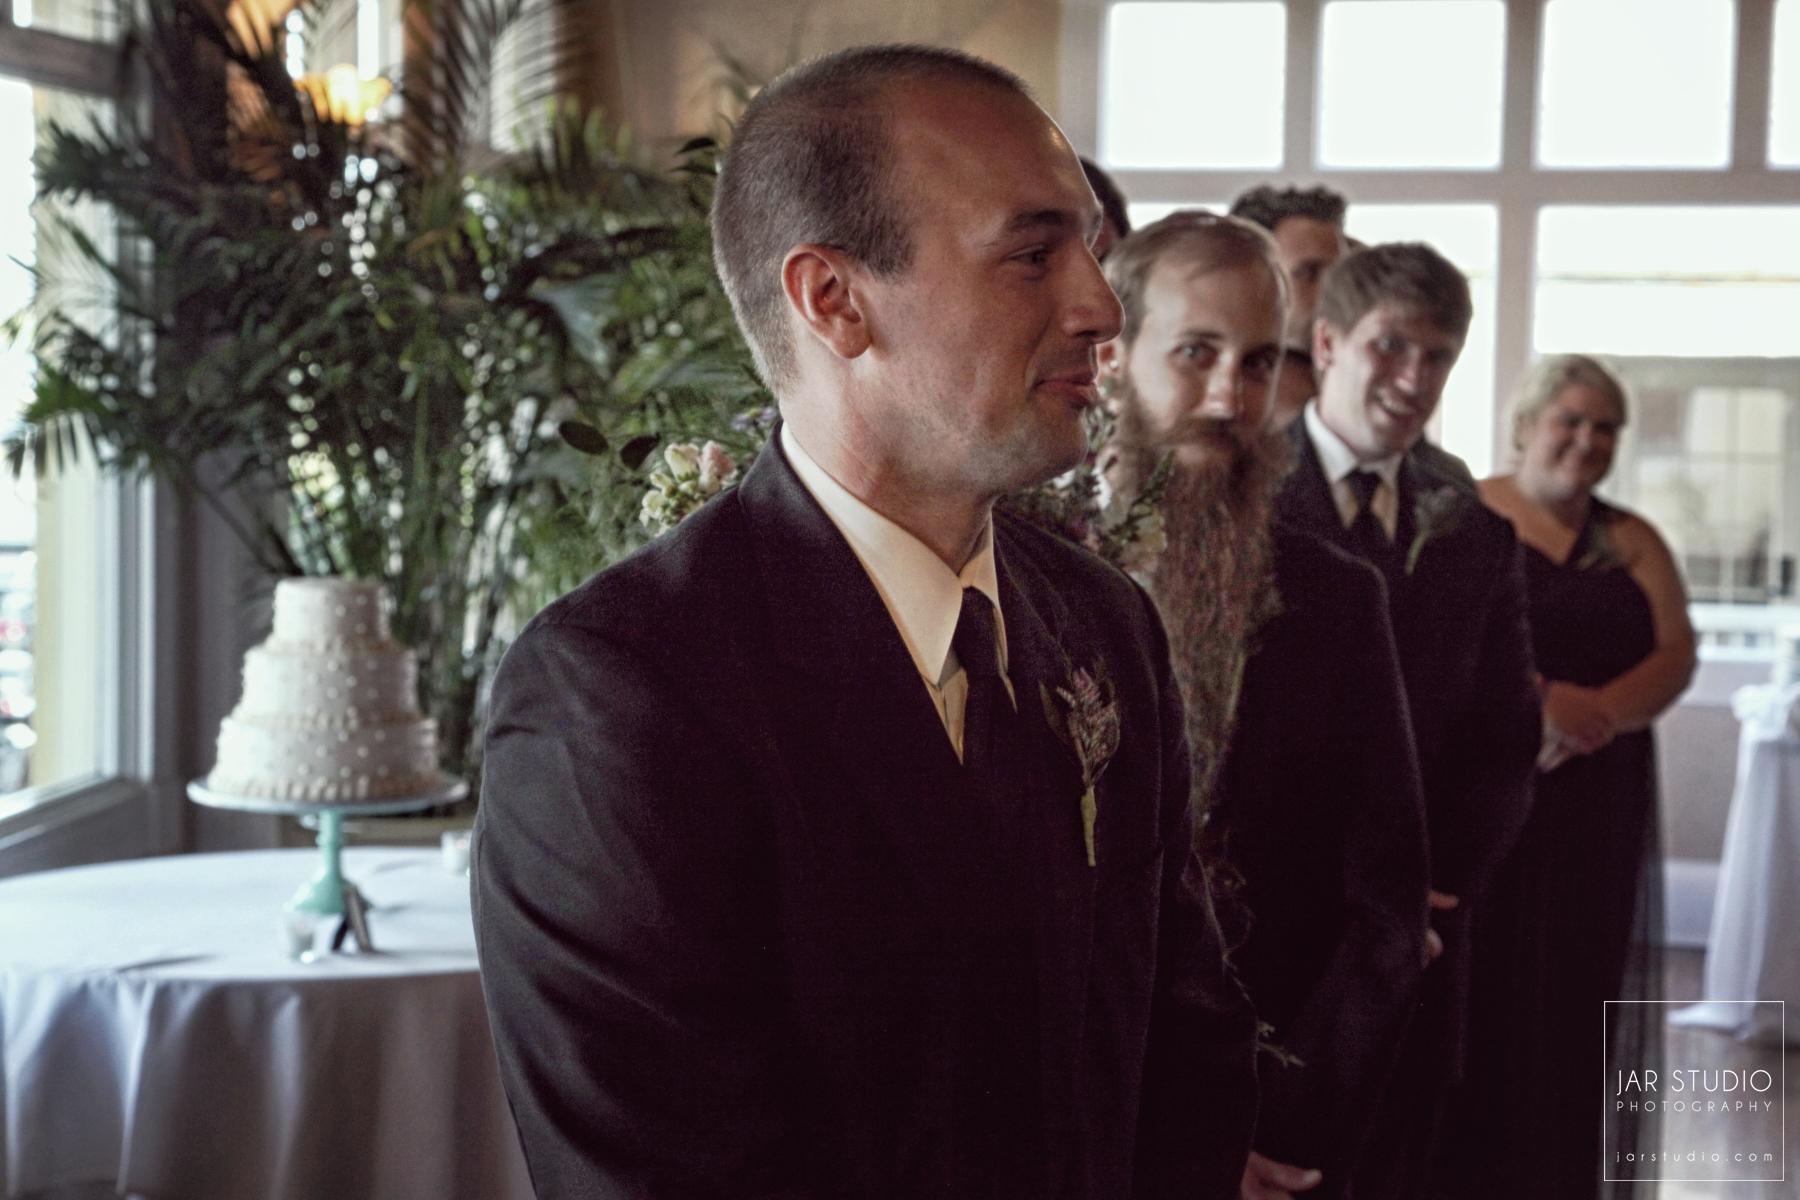 11-wedding-ceremony-the-white-room-st.augustine-jarstudio-photography.JPG